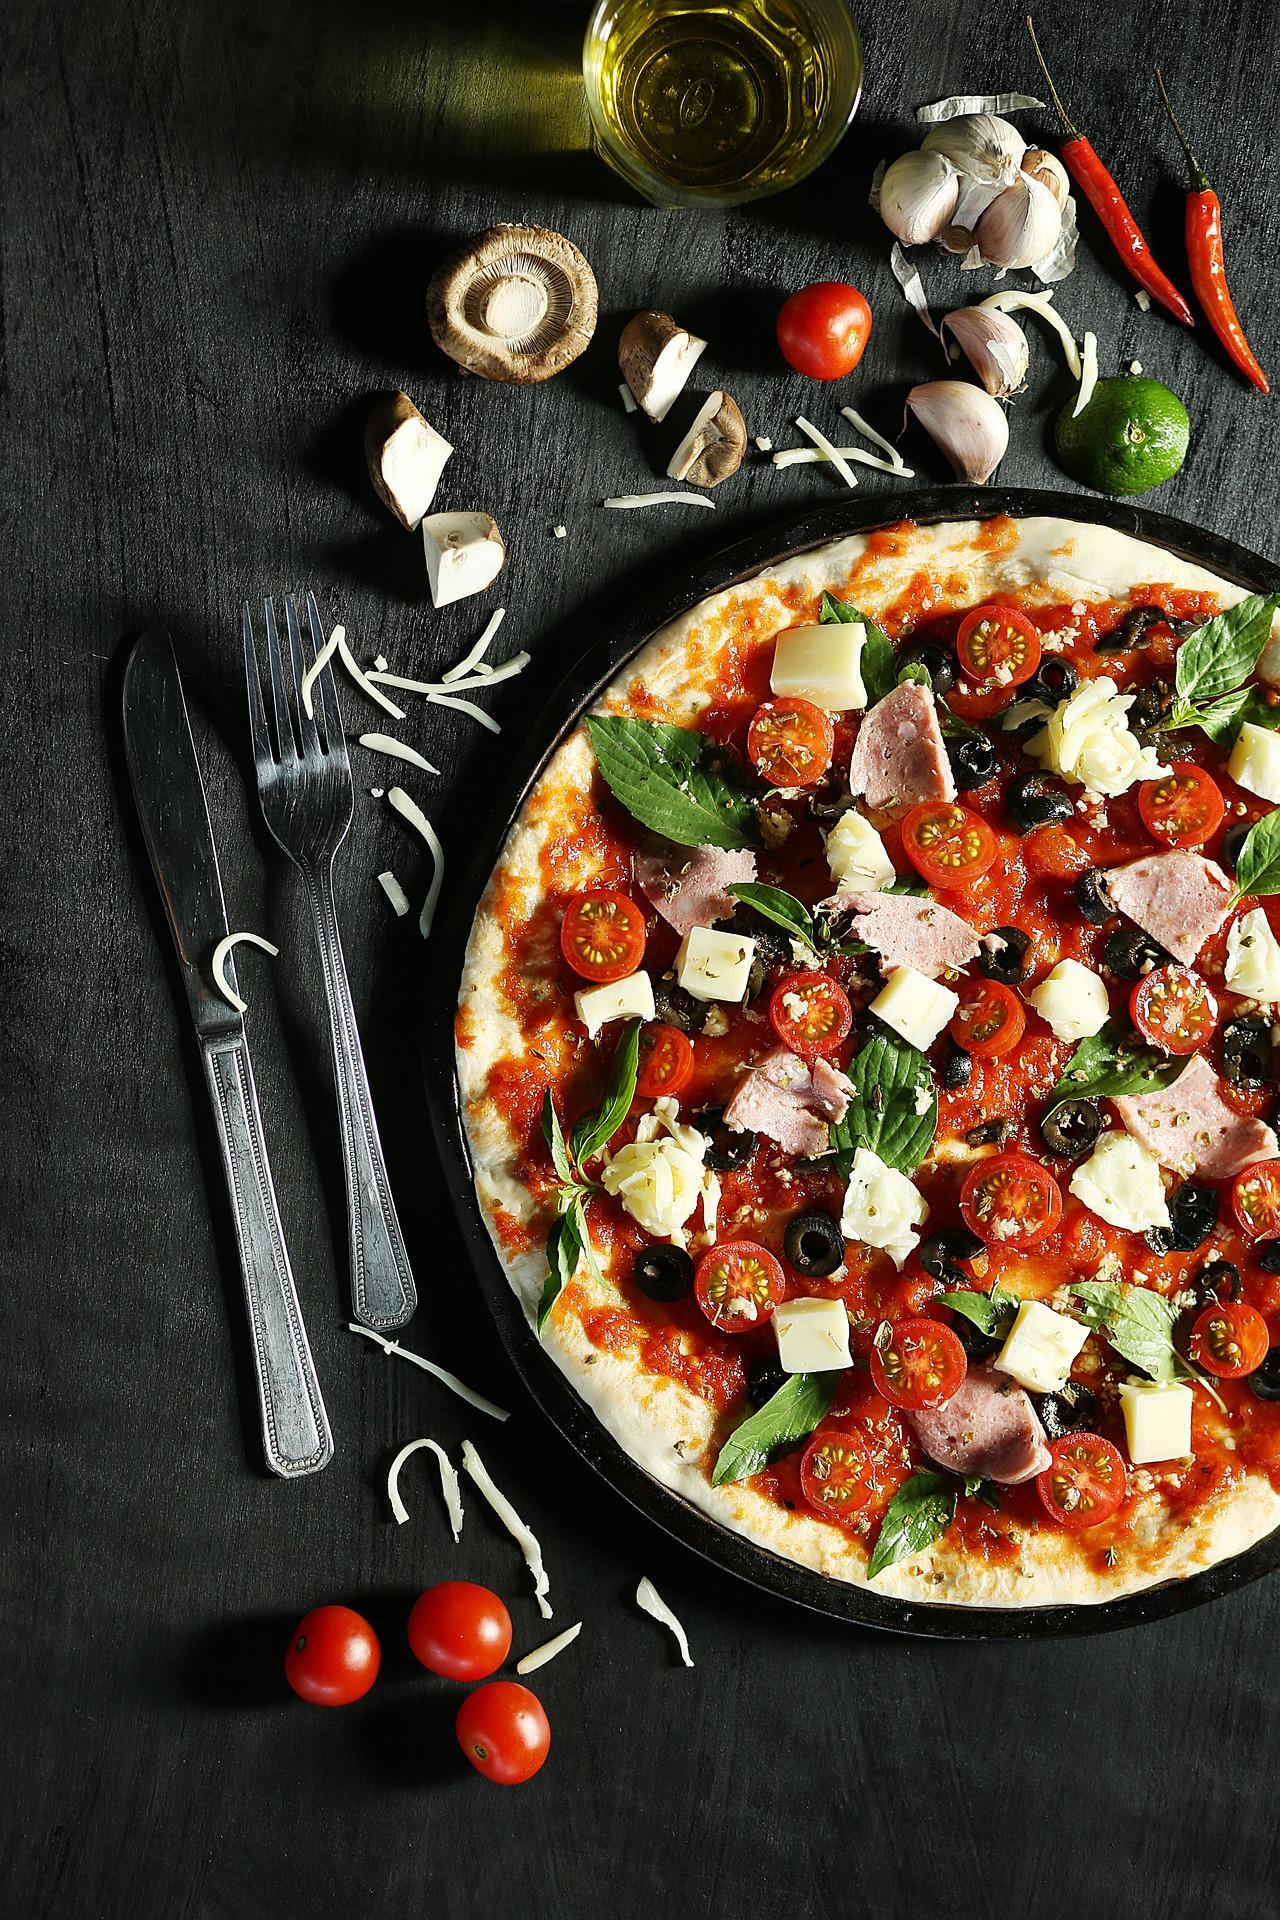 Pizza And Pasta, My Two Loves- freshmenu.com